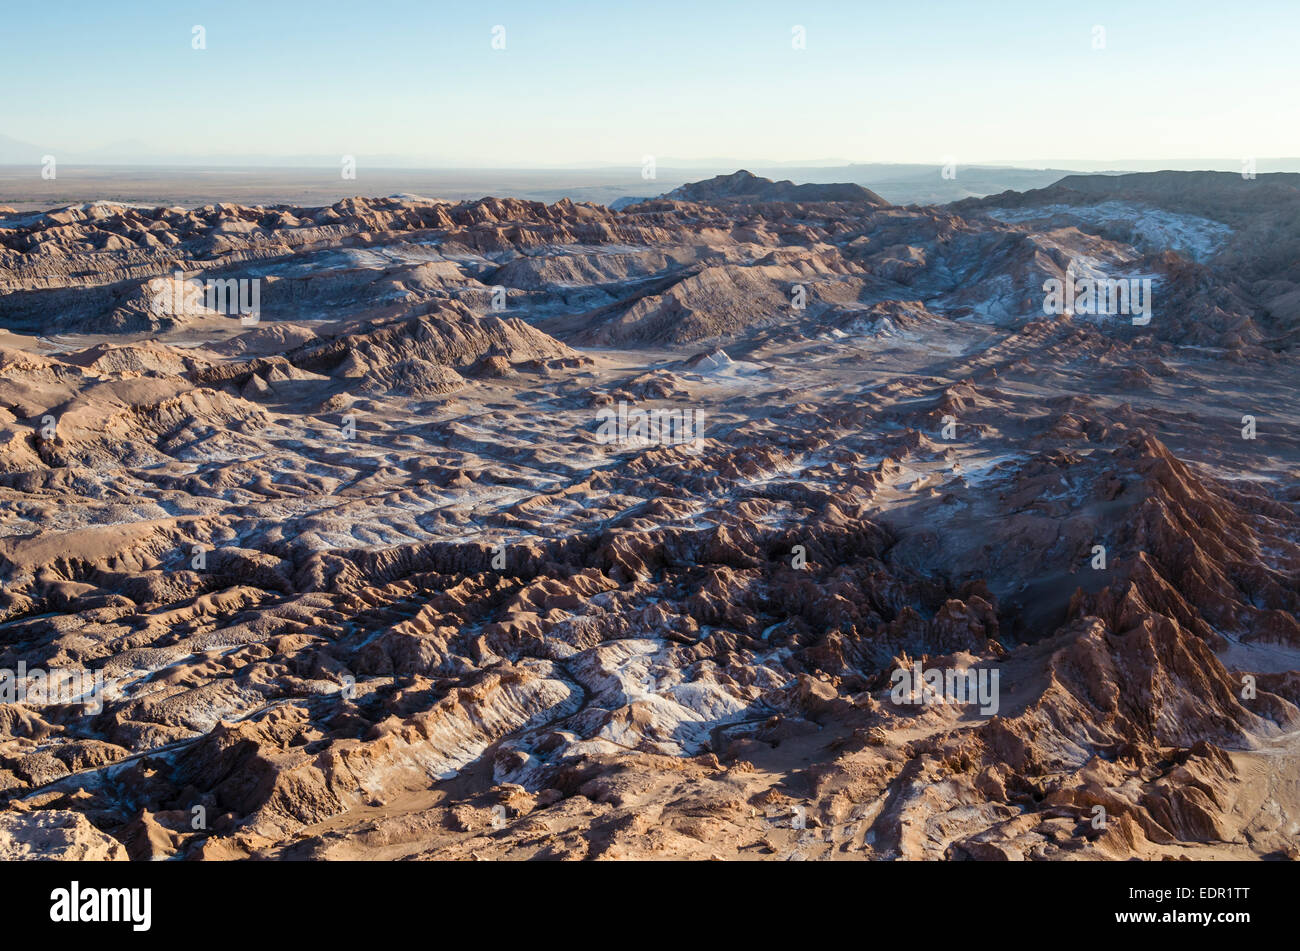 Atacama Desert, Chile - Stock Image